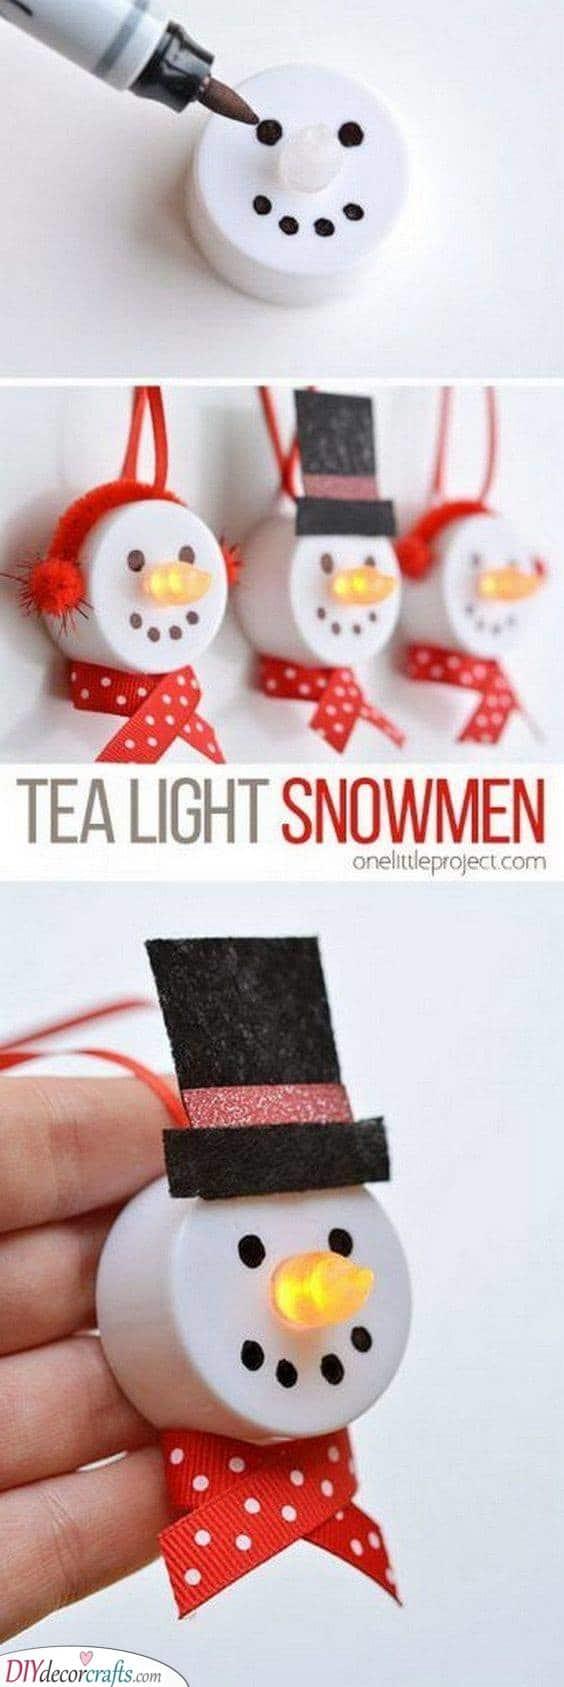 Tea Light Snowmen - Homemade Christmas Tree Decorations